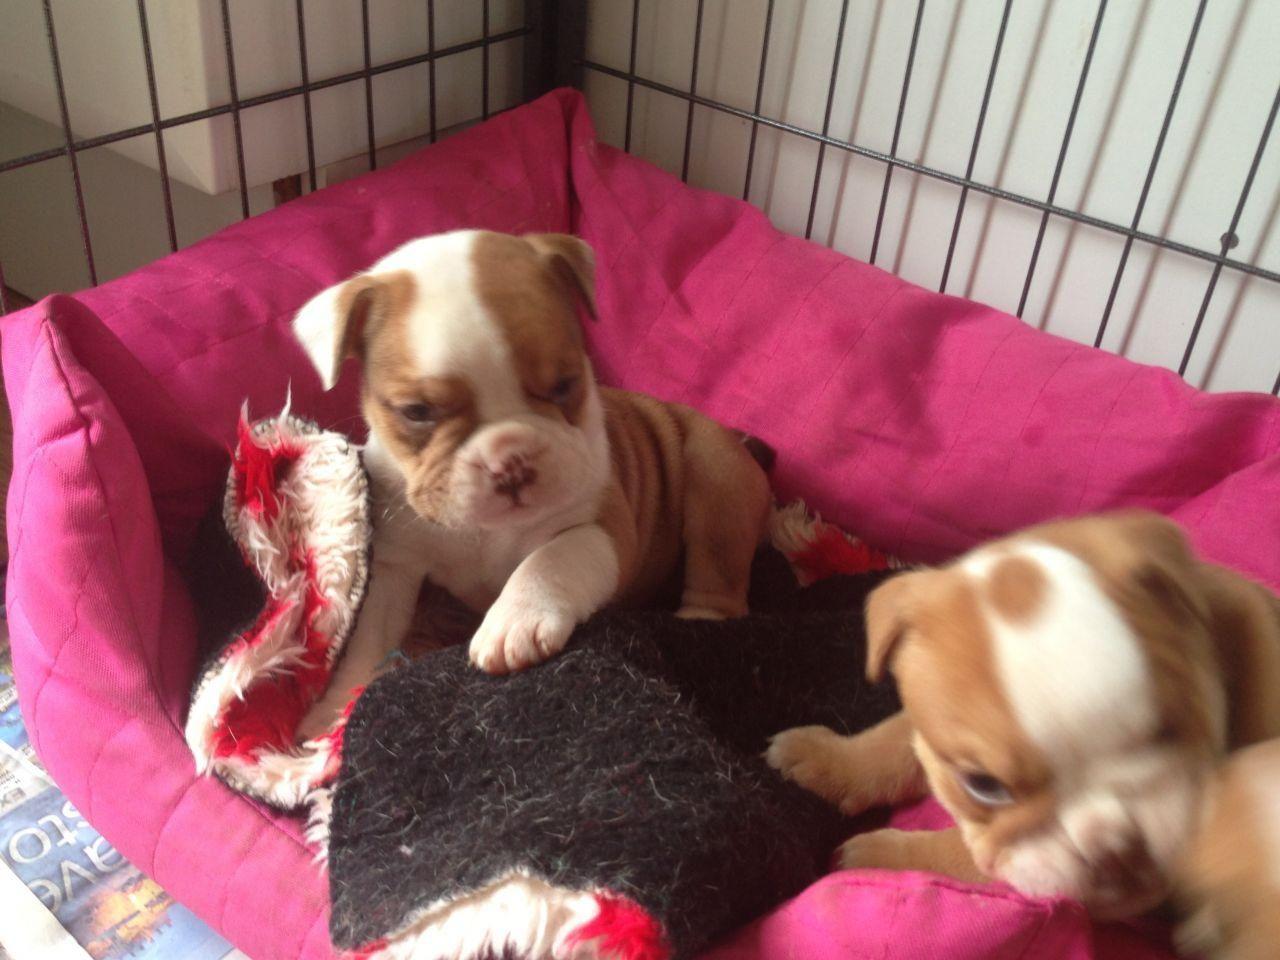 Beautiful Kc Reg English bulldog Puppies, Boy And Girl